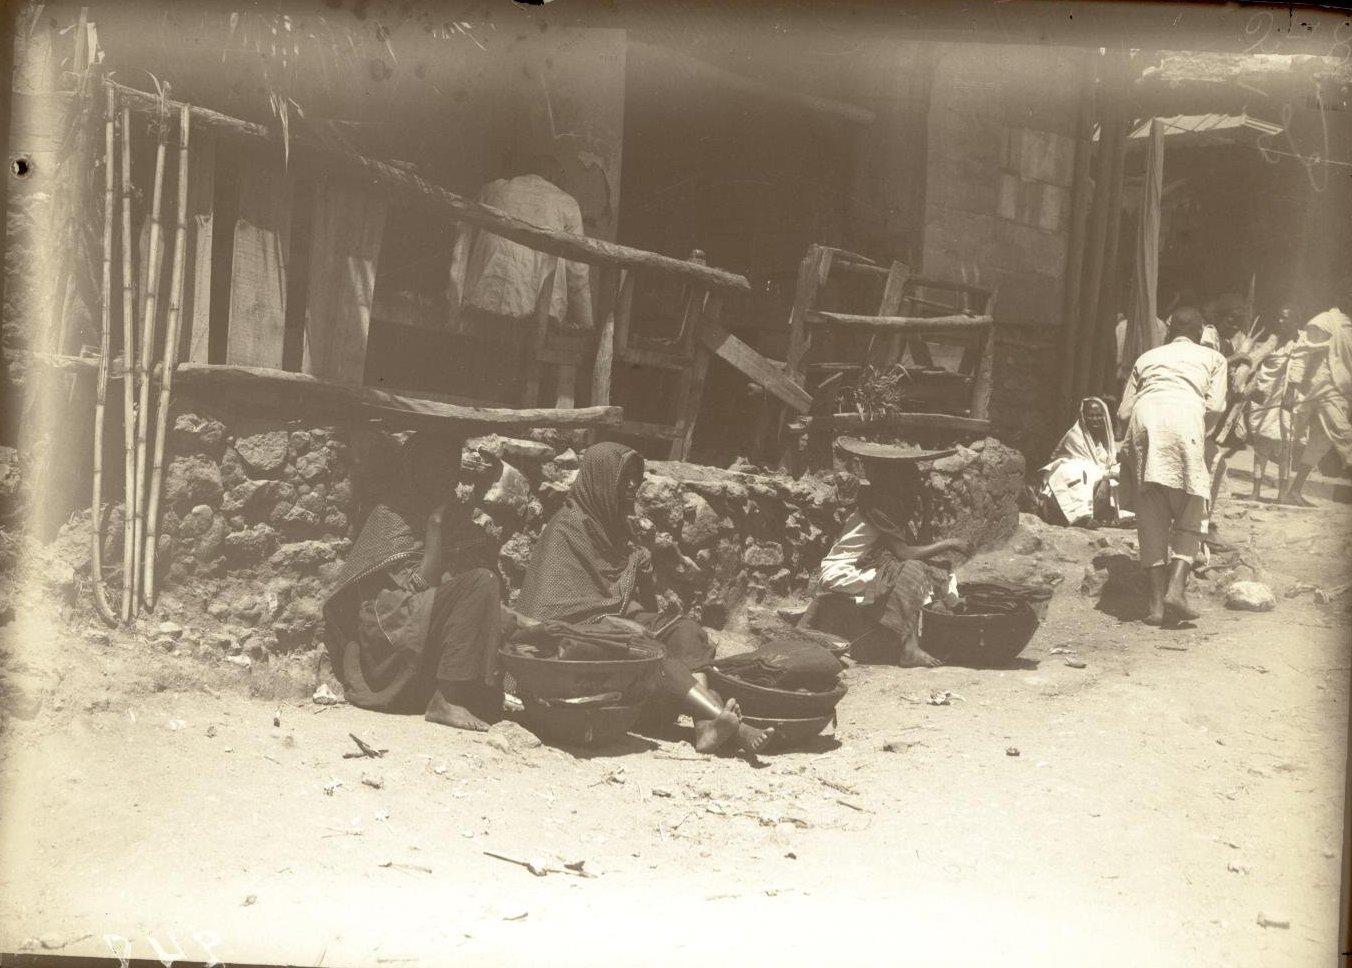 248. Абиссиния, провинция Харар, г. Харар. На базаре